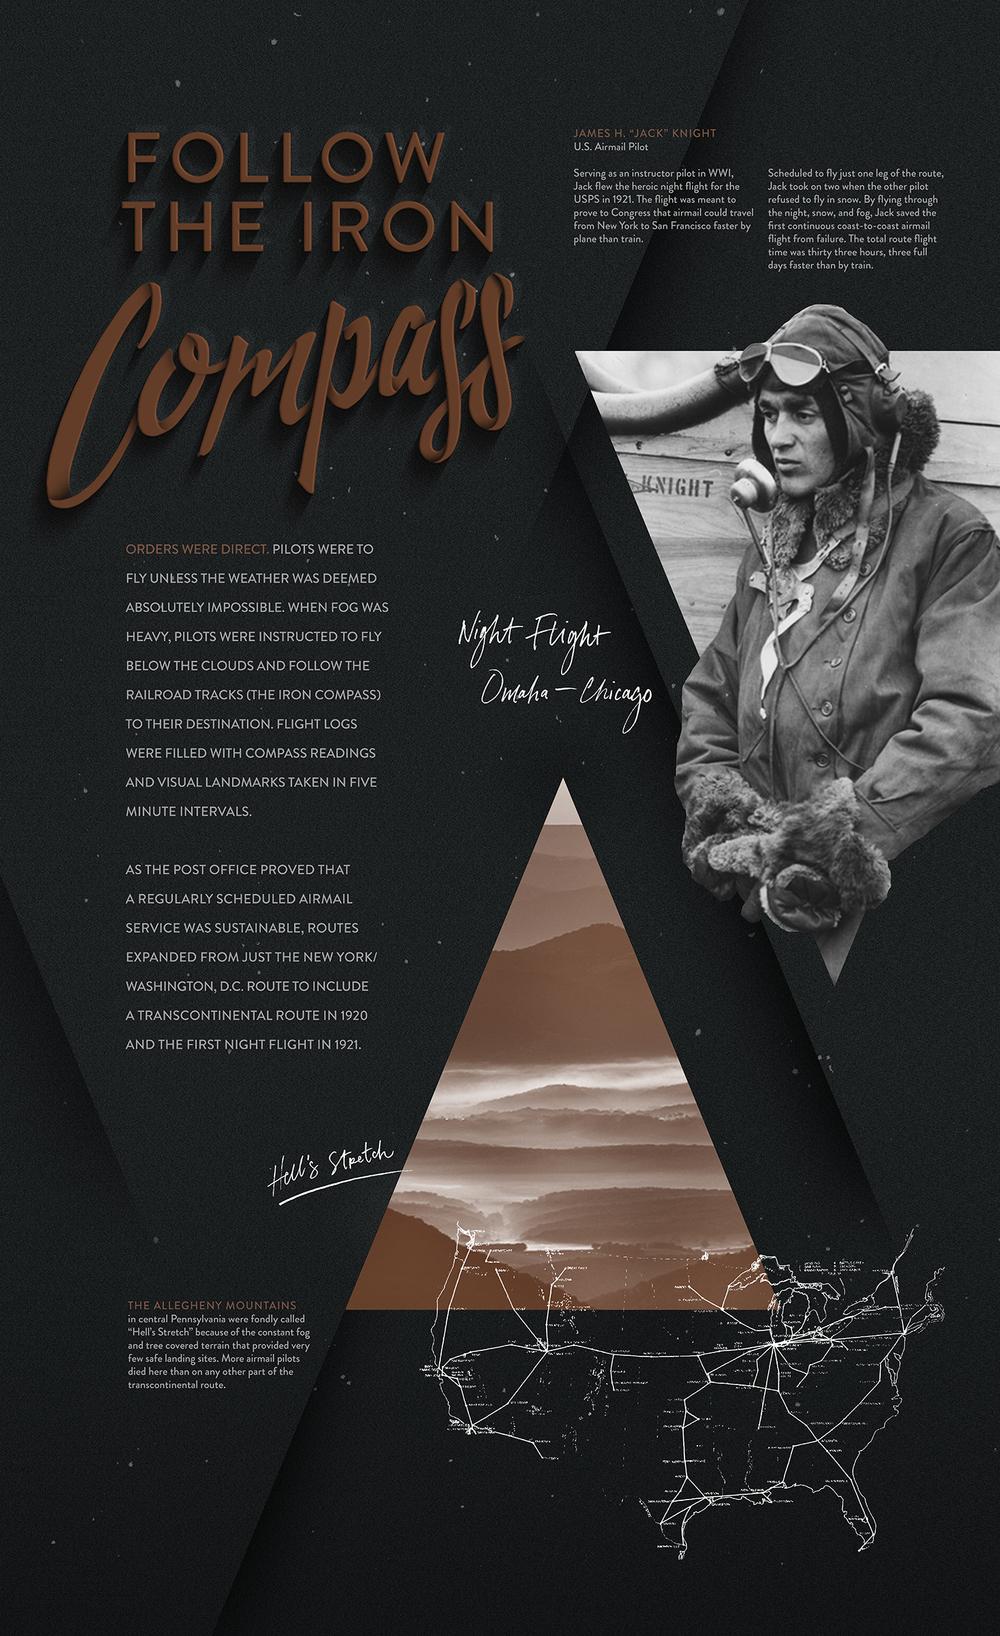 iron compass_V2.jpg